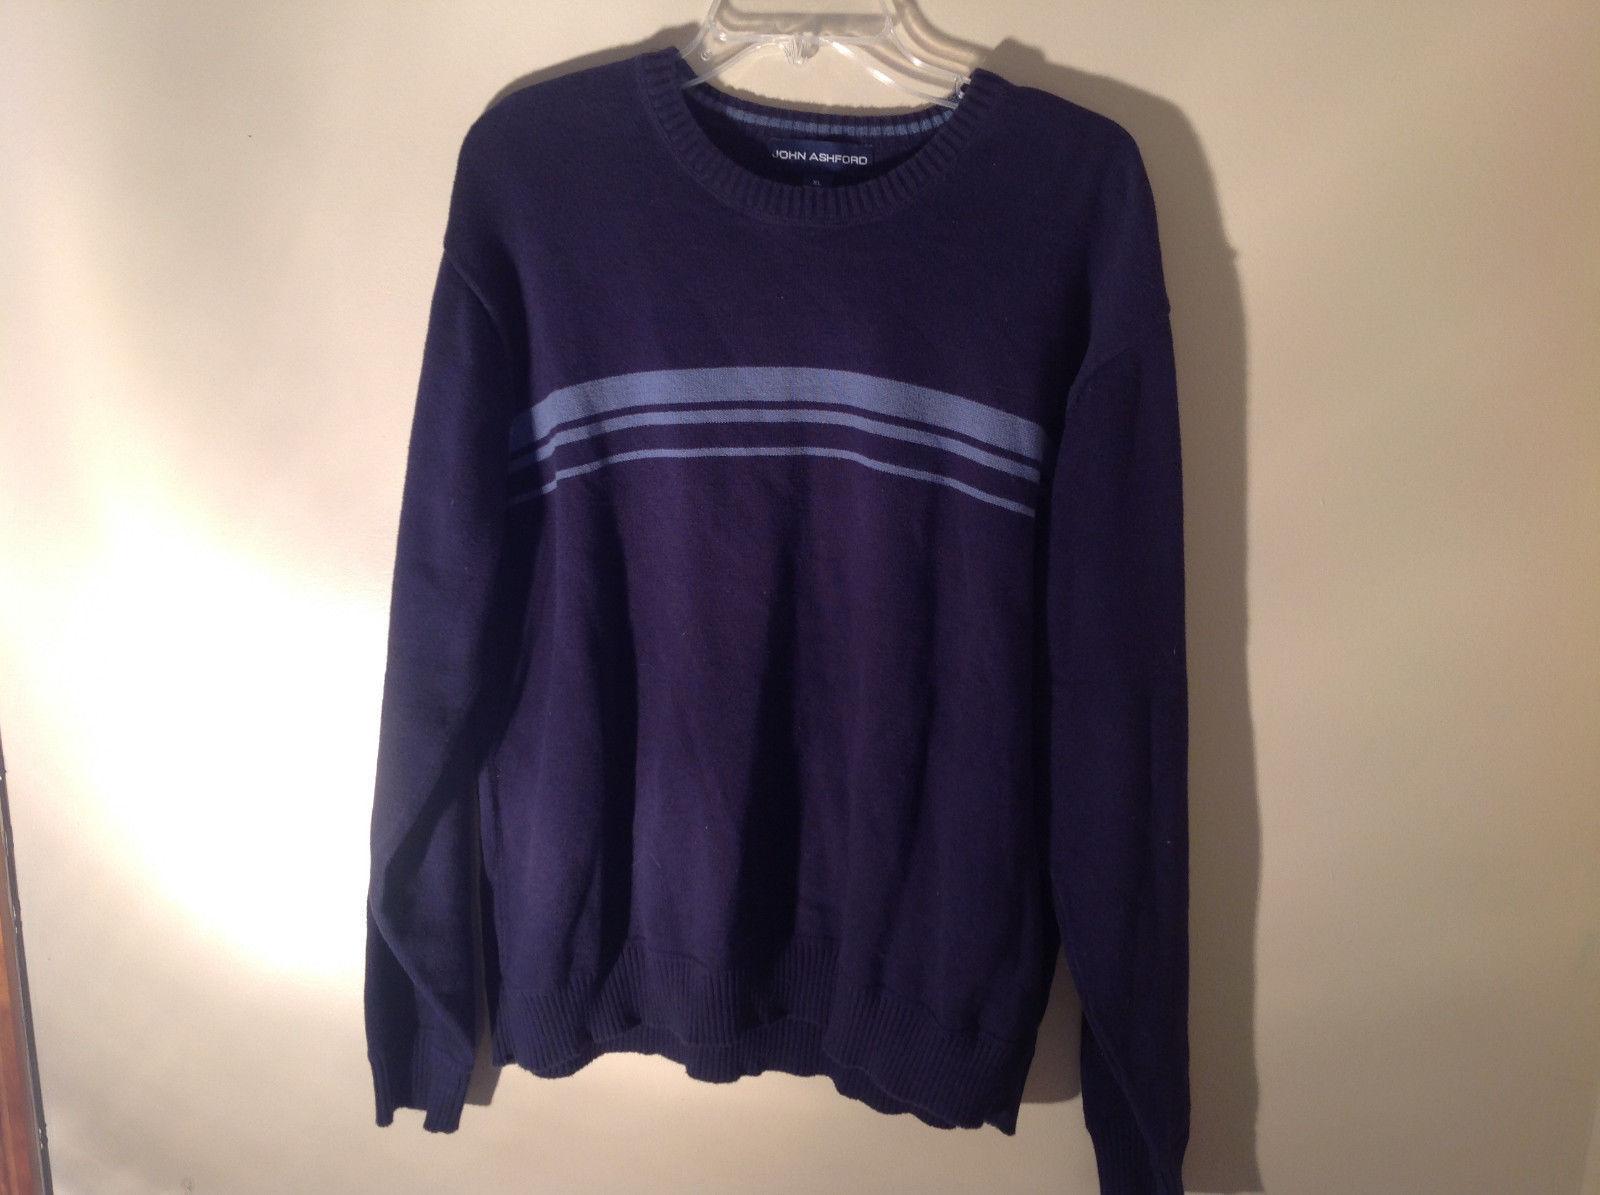 John Ashford Dark Blue with Light Blue Stripe Stretchy Sweater Stretchy Size XL